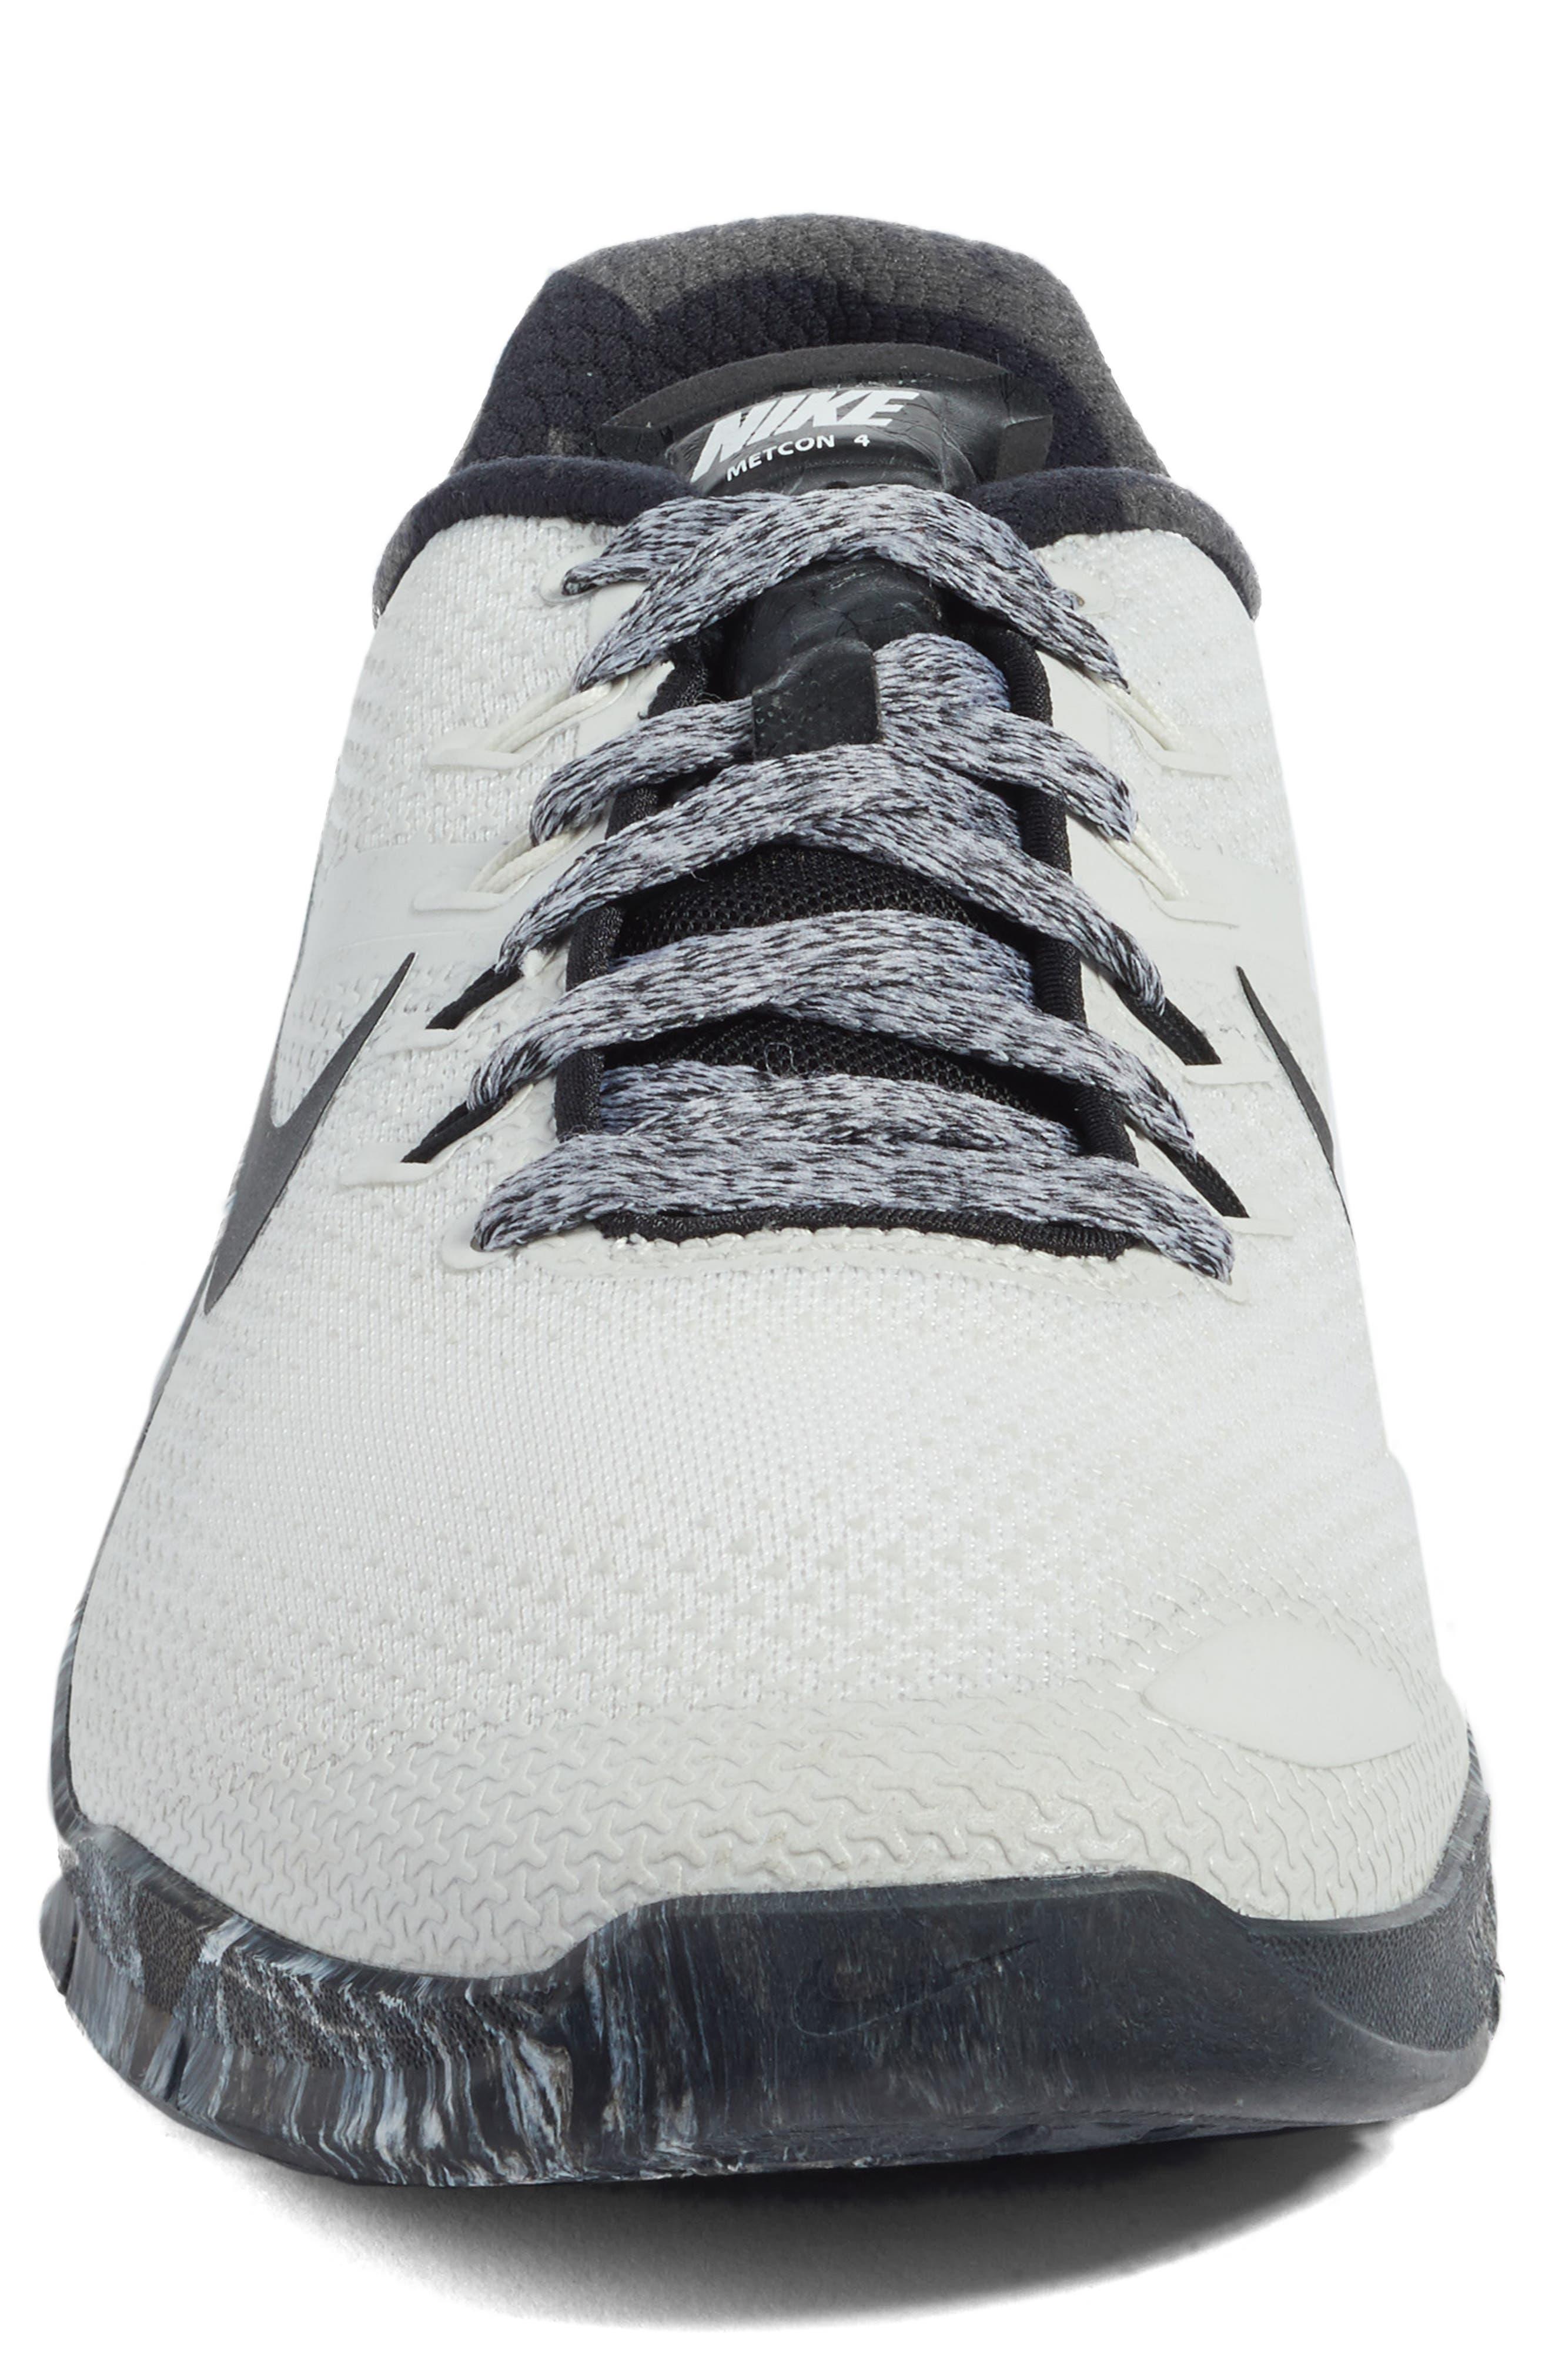 Metcon 4 Training Shoe,                             Alternate thumbnail 58, color,